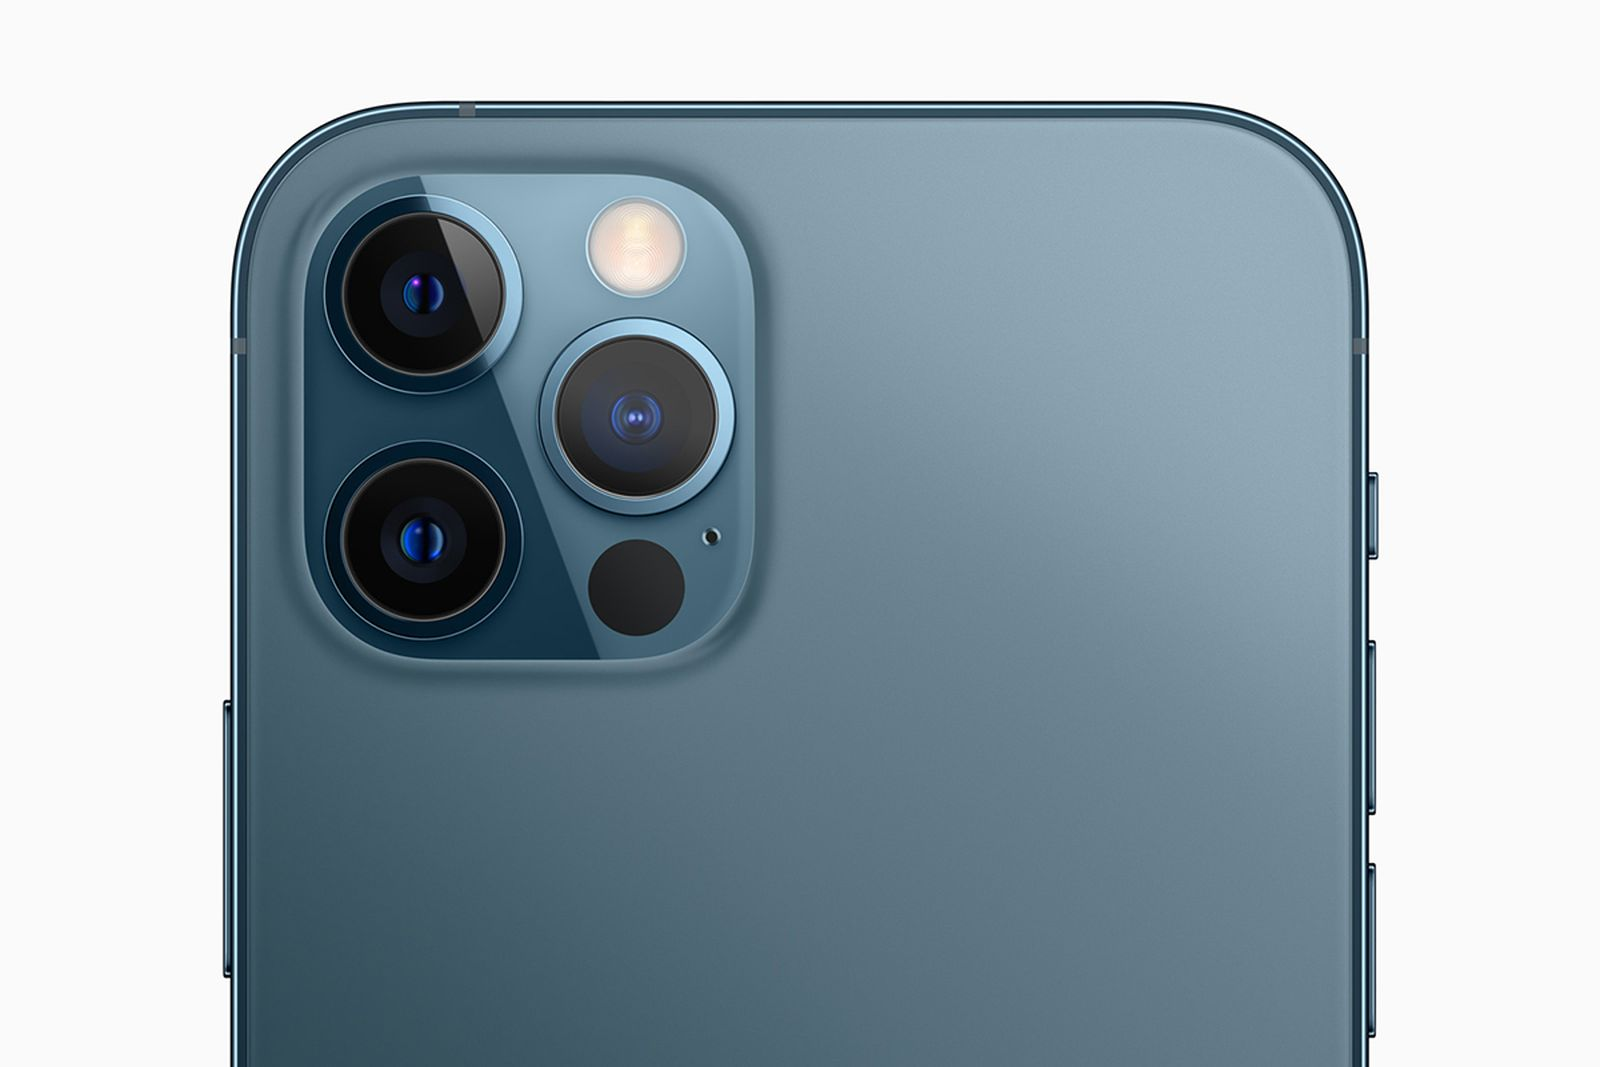 apple-iphone-12-release-date-price-1-03